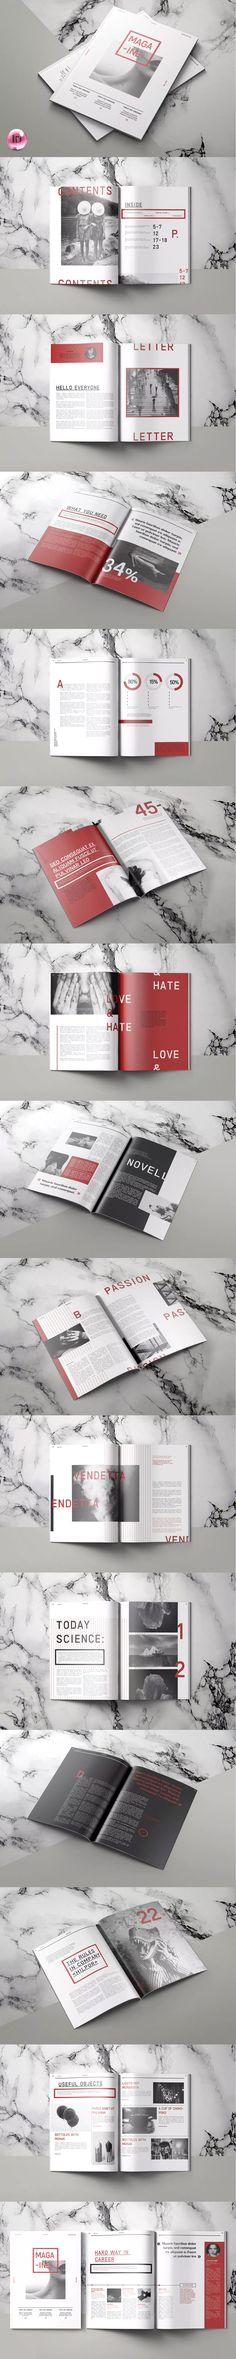 Modernist Magazine Template InDesign INDD A4